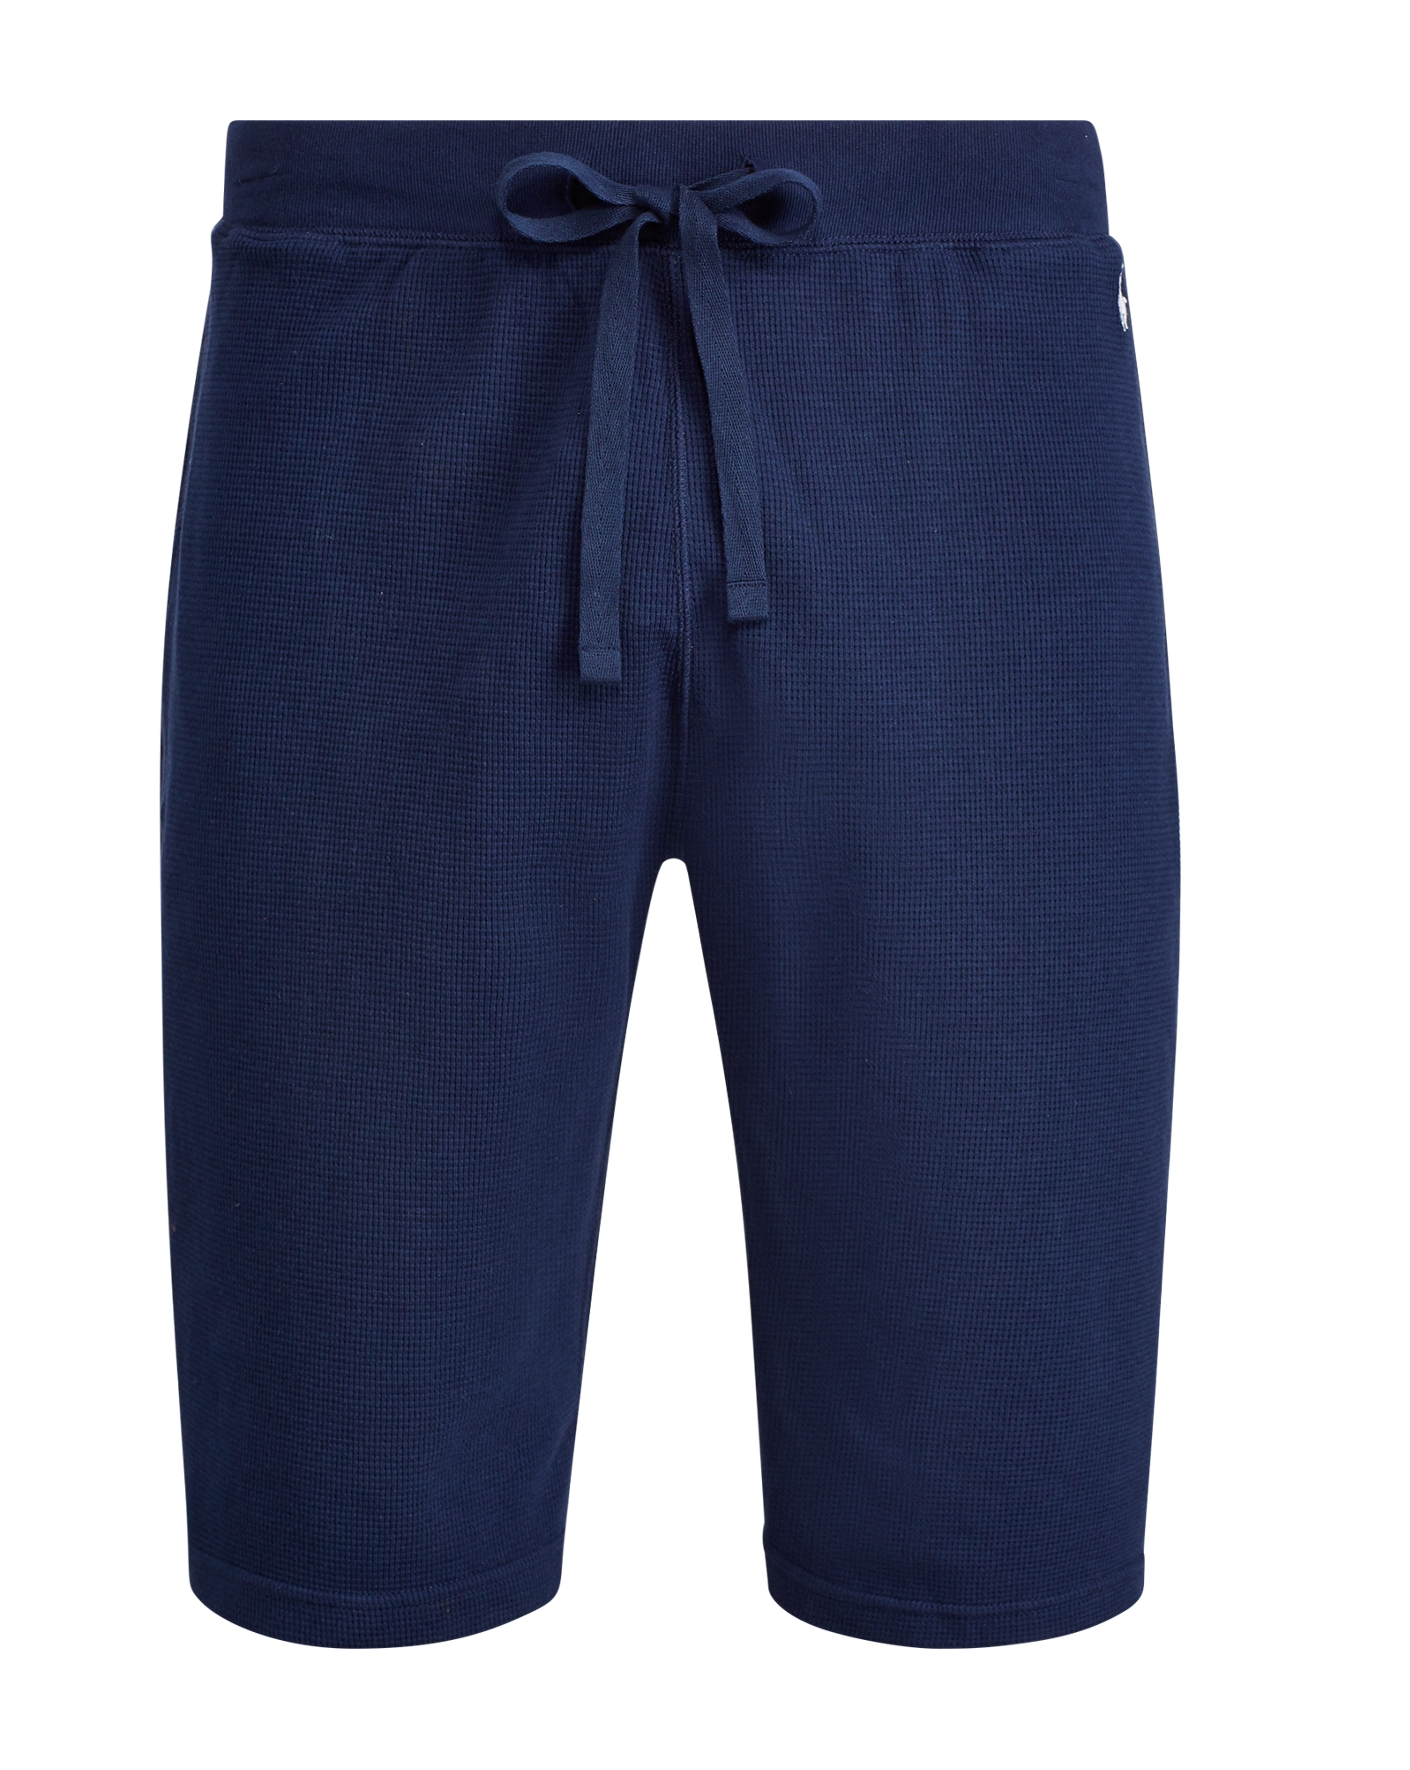 Men's Pajamas, Pajamas Set & Sleepwear Sets | Ralph Lauren